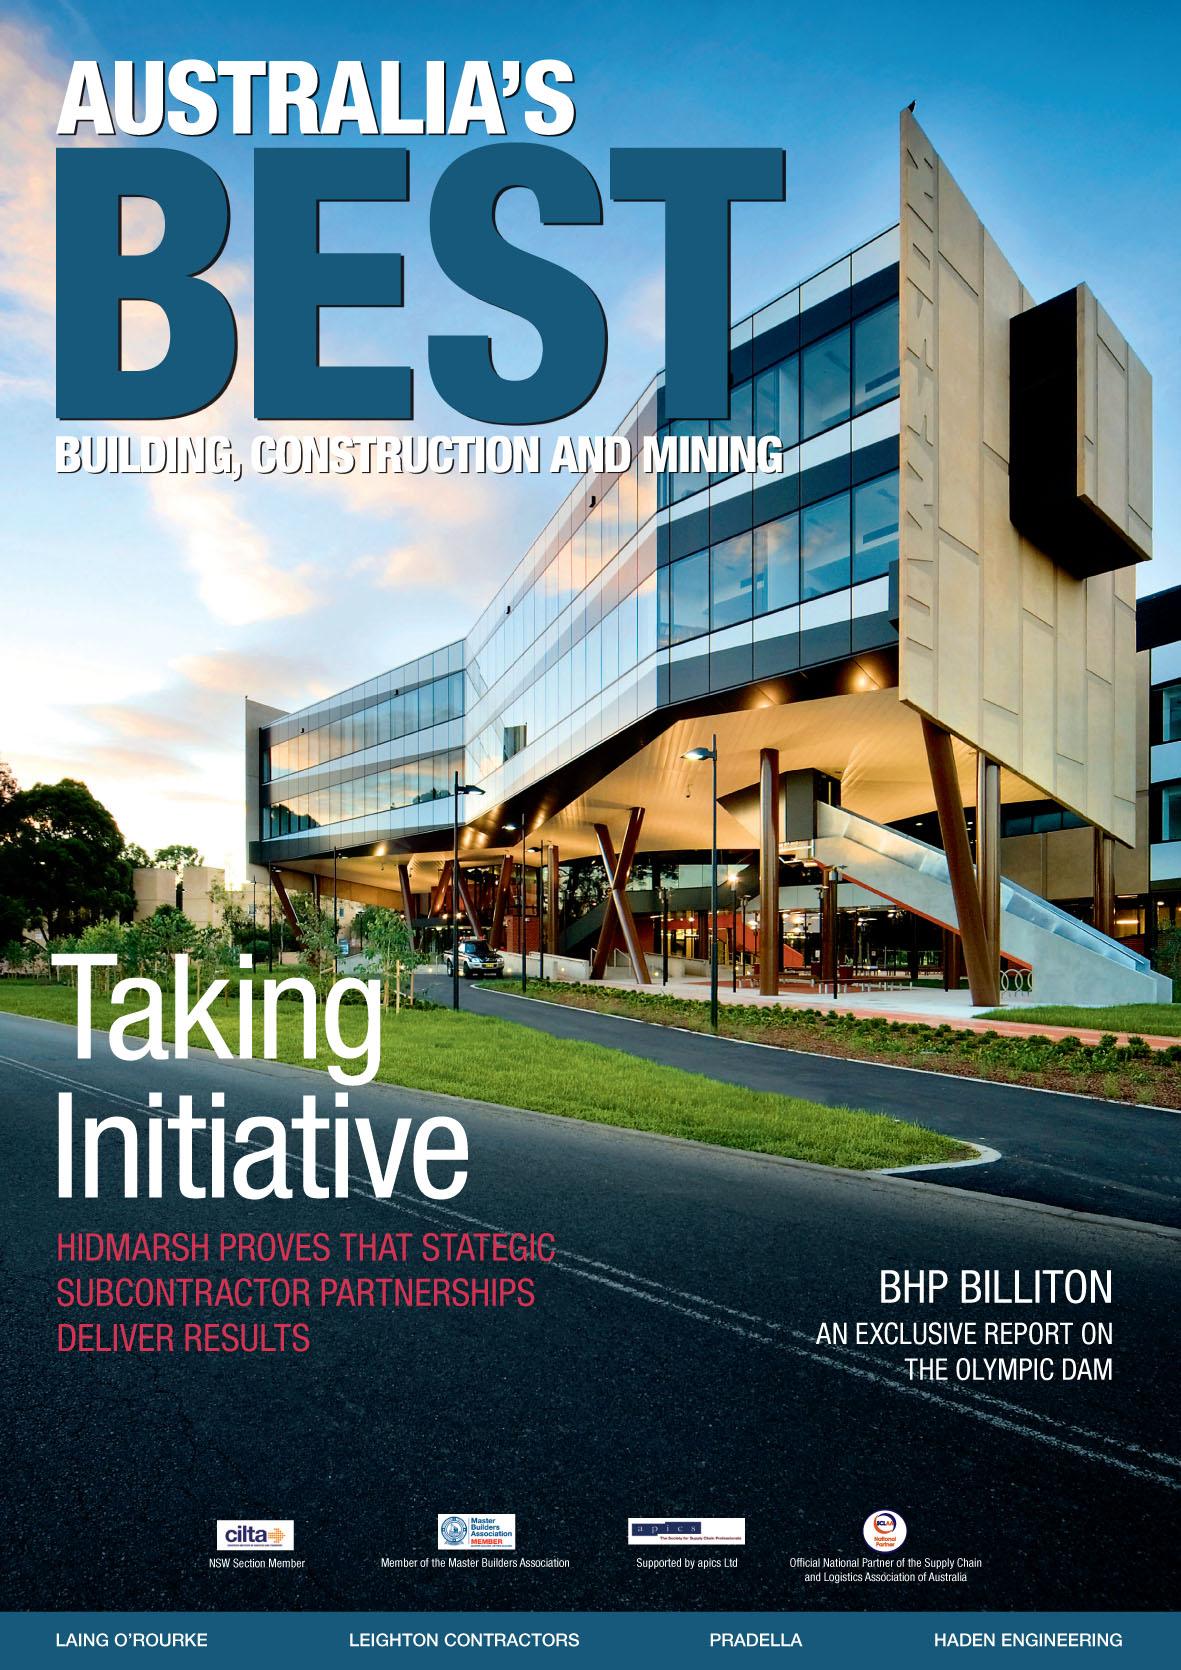 Bean Media S Australia S Best Building Construction And